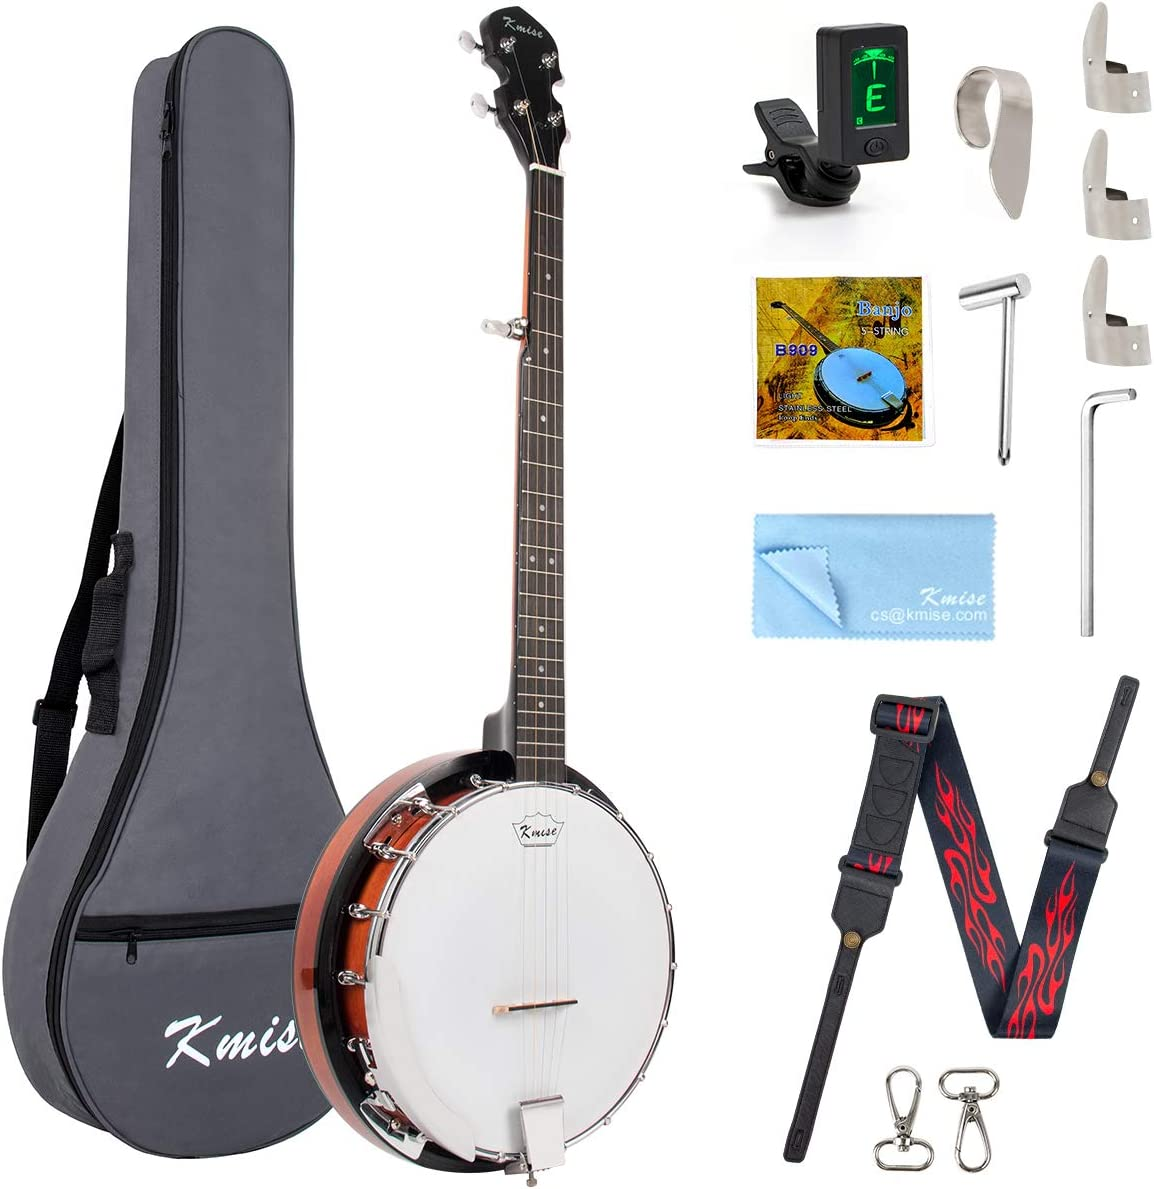 Ranking integrated 1st San Jose Mall place Kmise 5-String Banjo Full Size MI2953-KUS